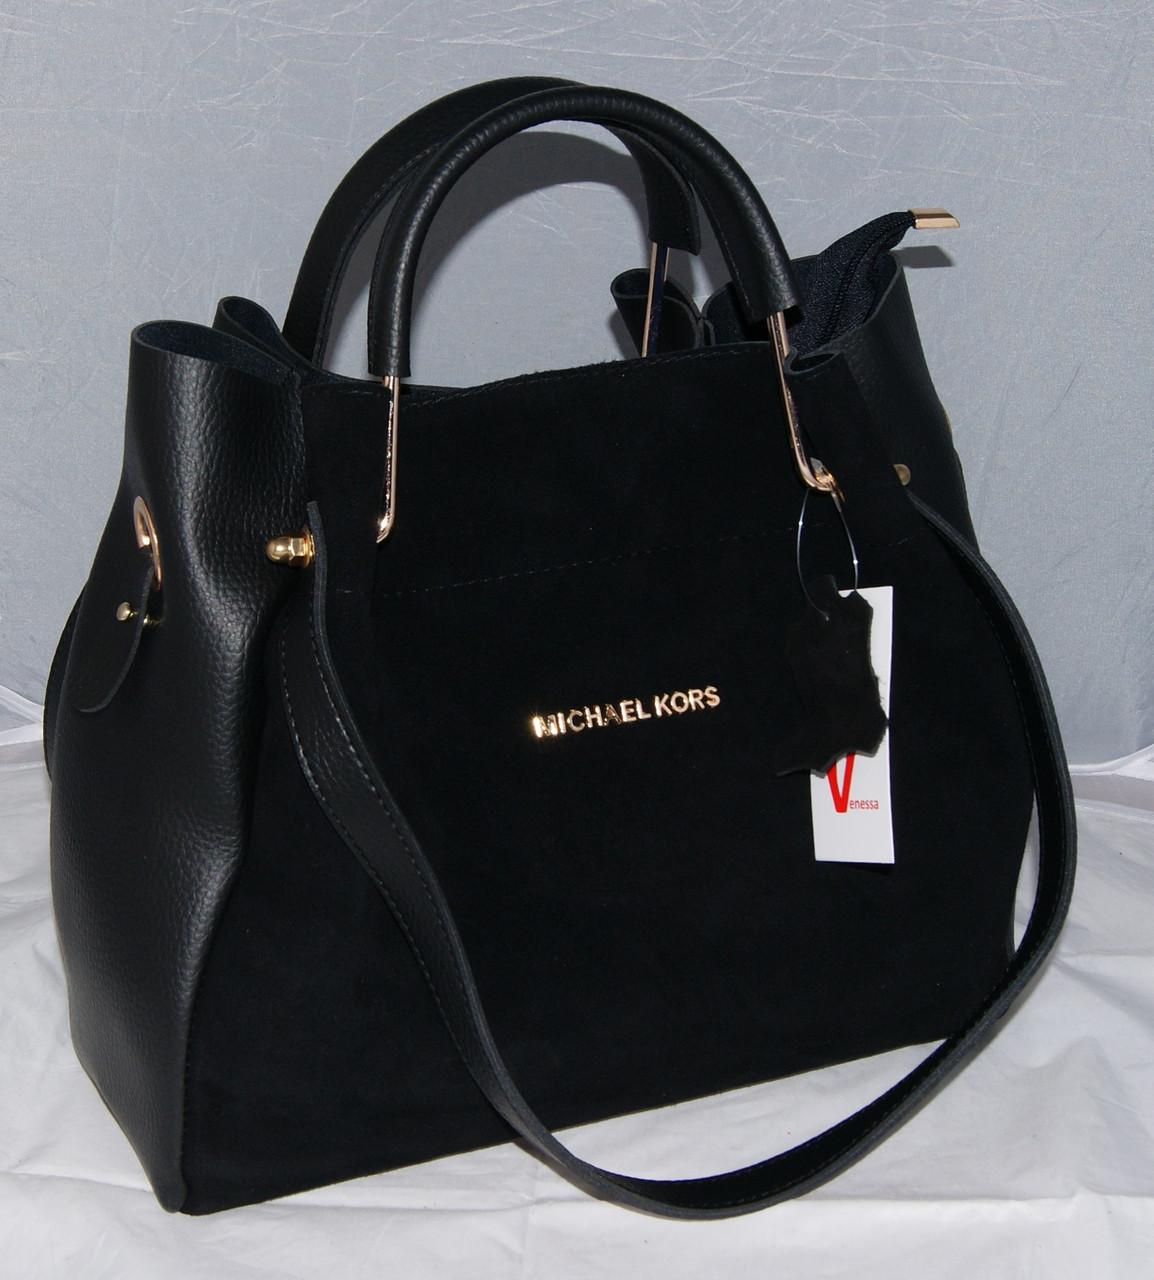 a854d51318cd Женская черная замшевая сумка-шоппер Michael Kors, MK, Майкл Корс ...